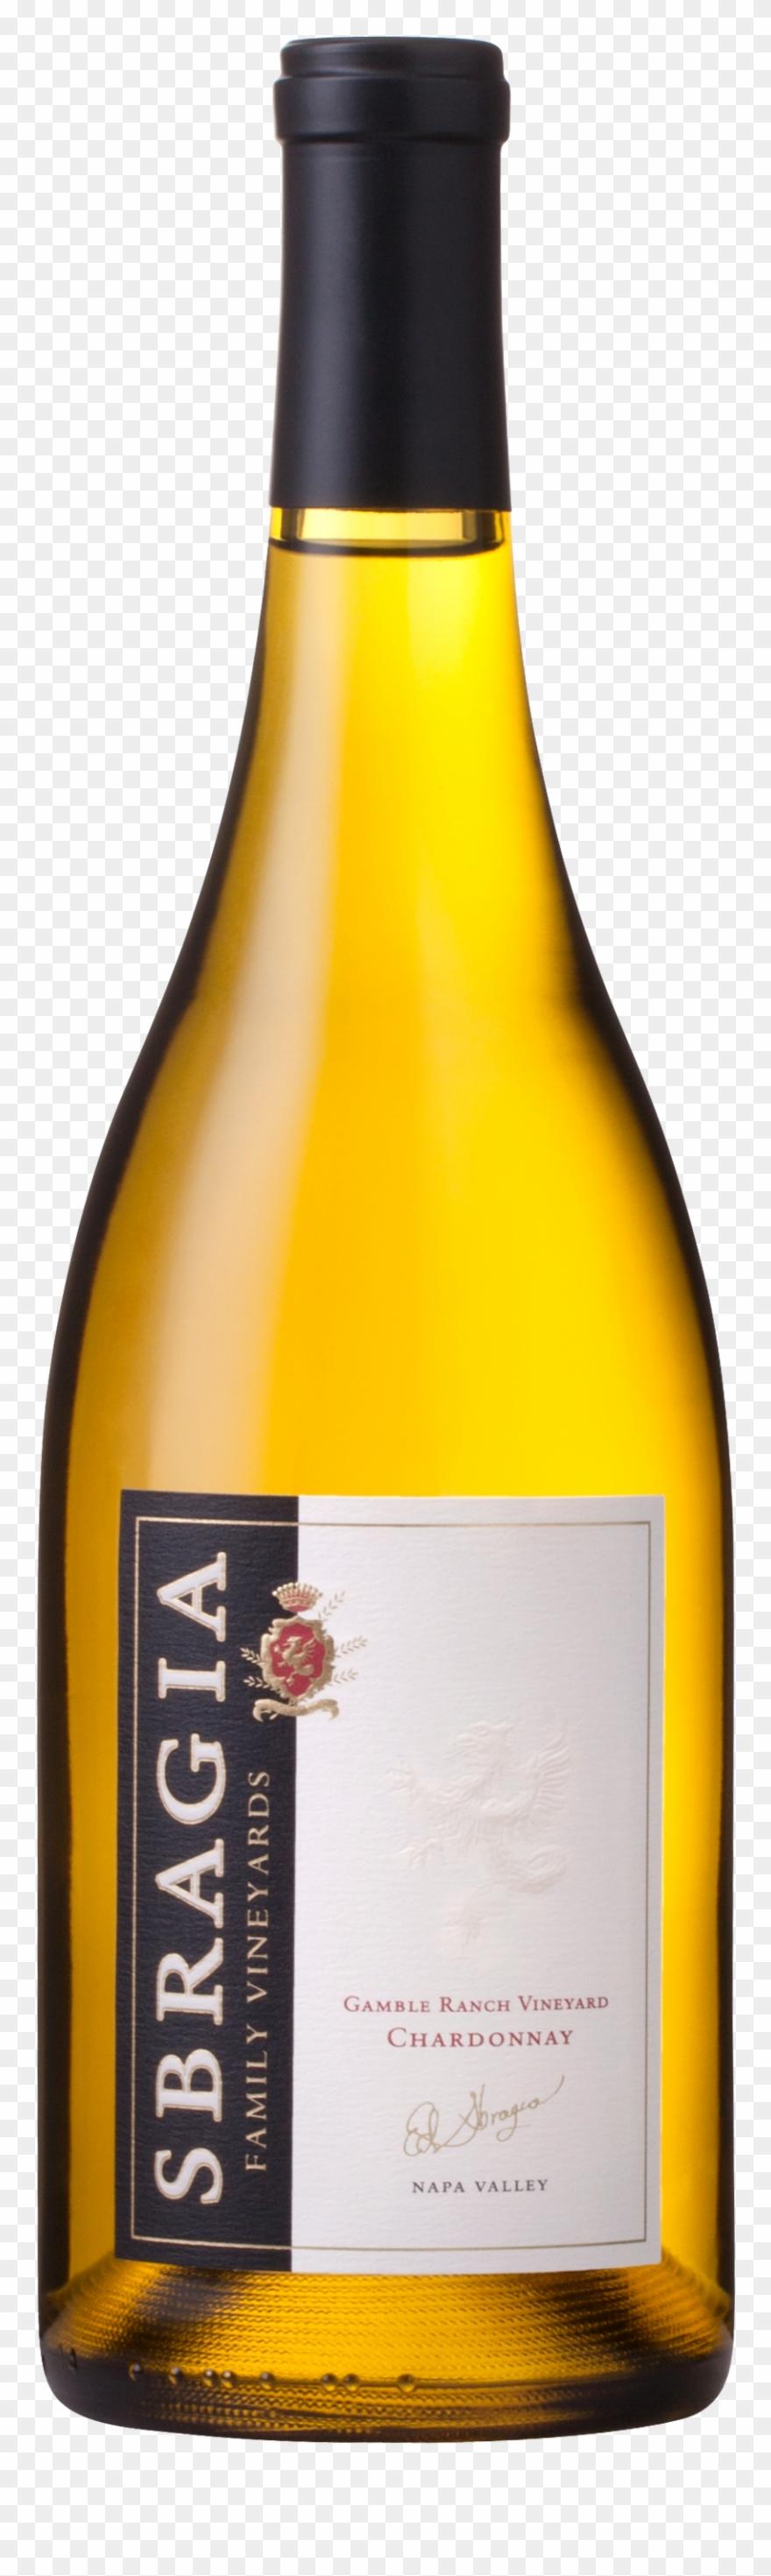 vineyard # 4877035